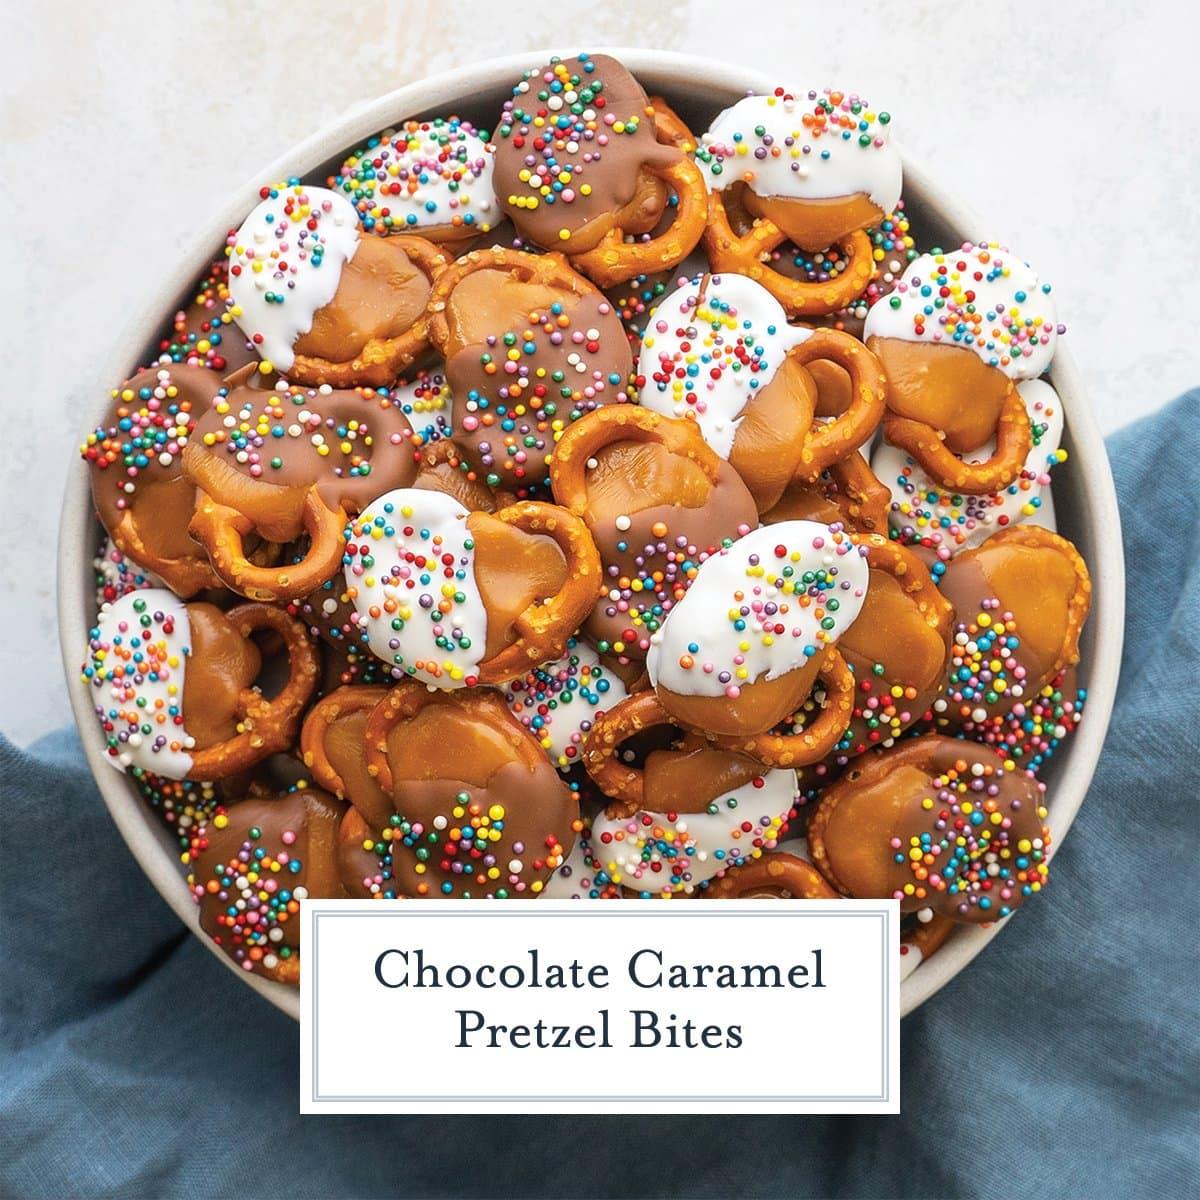 bowl of chocolate caramel pretzel bites